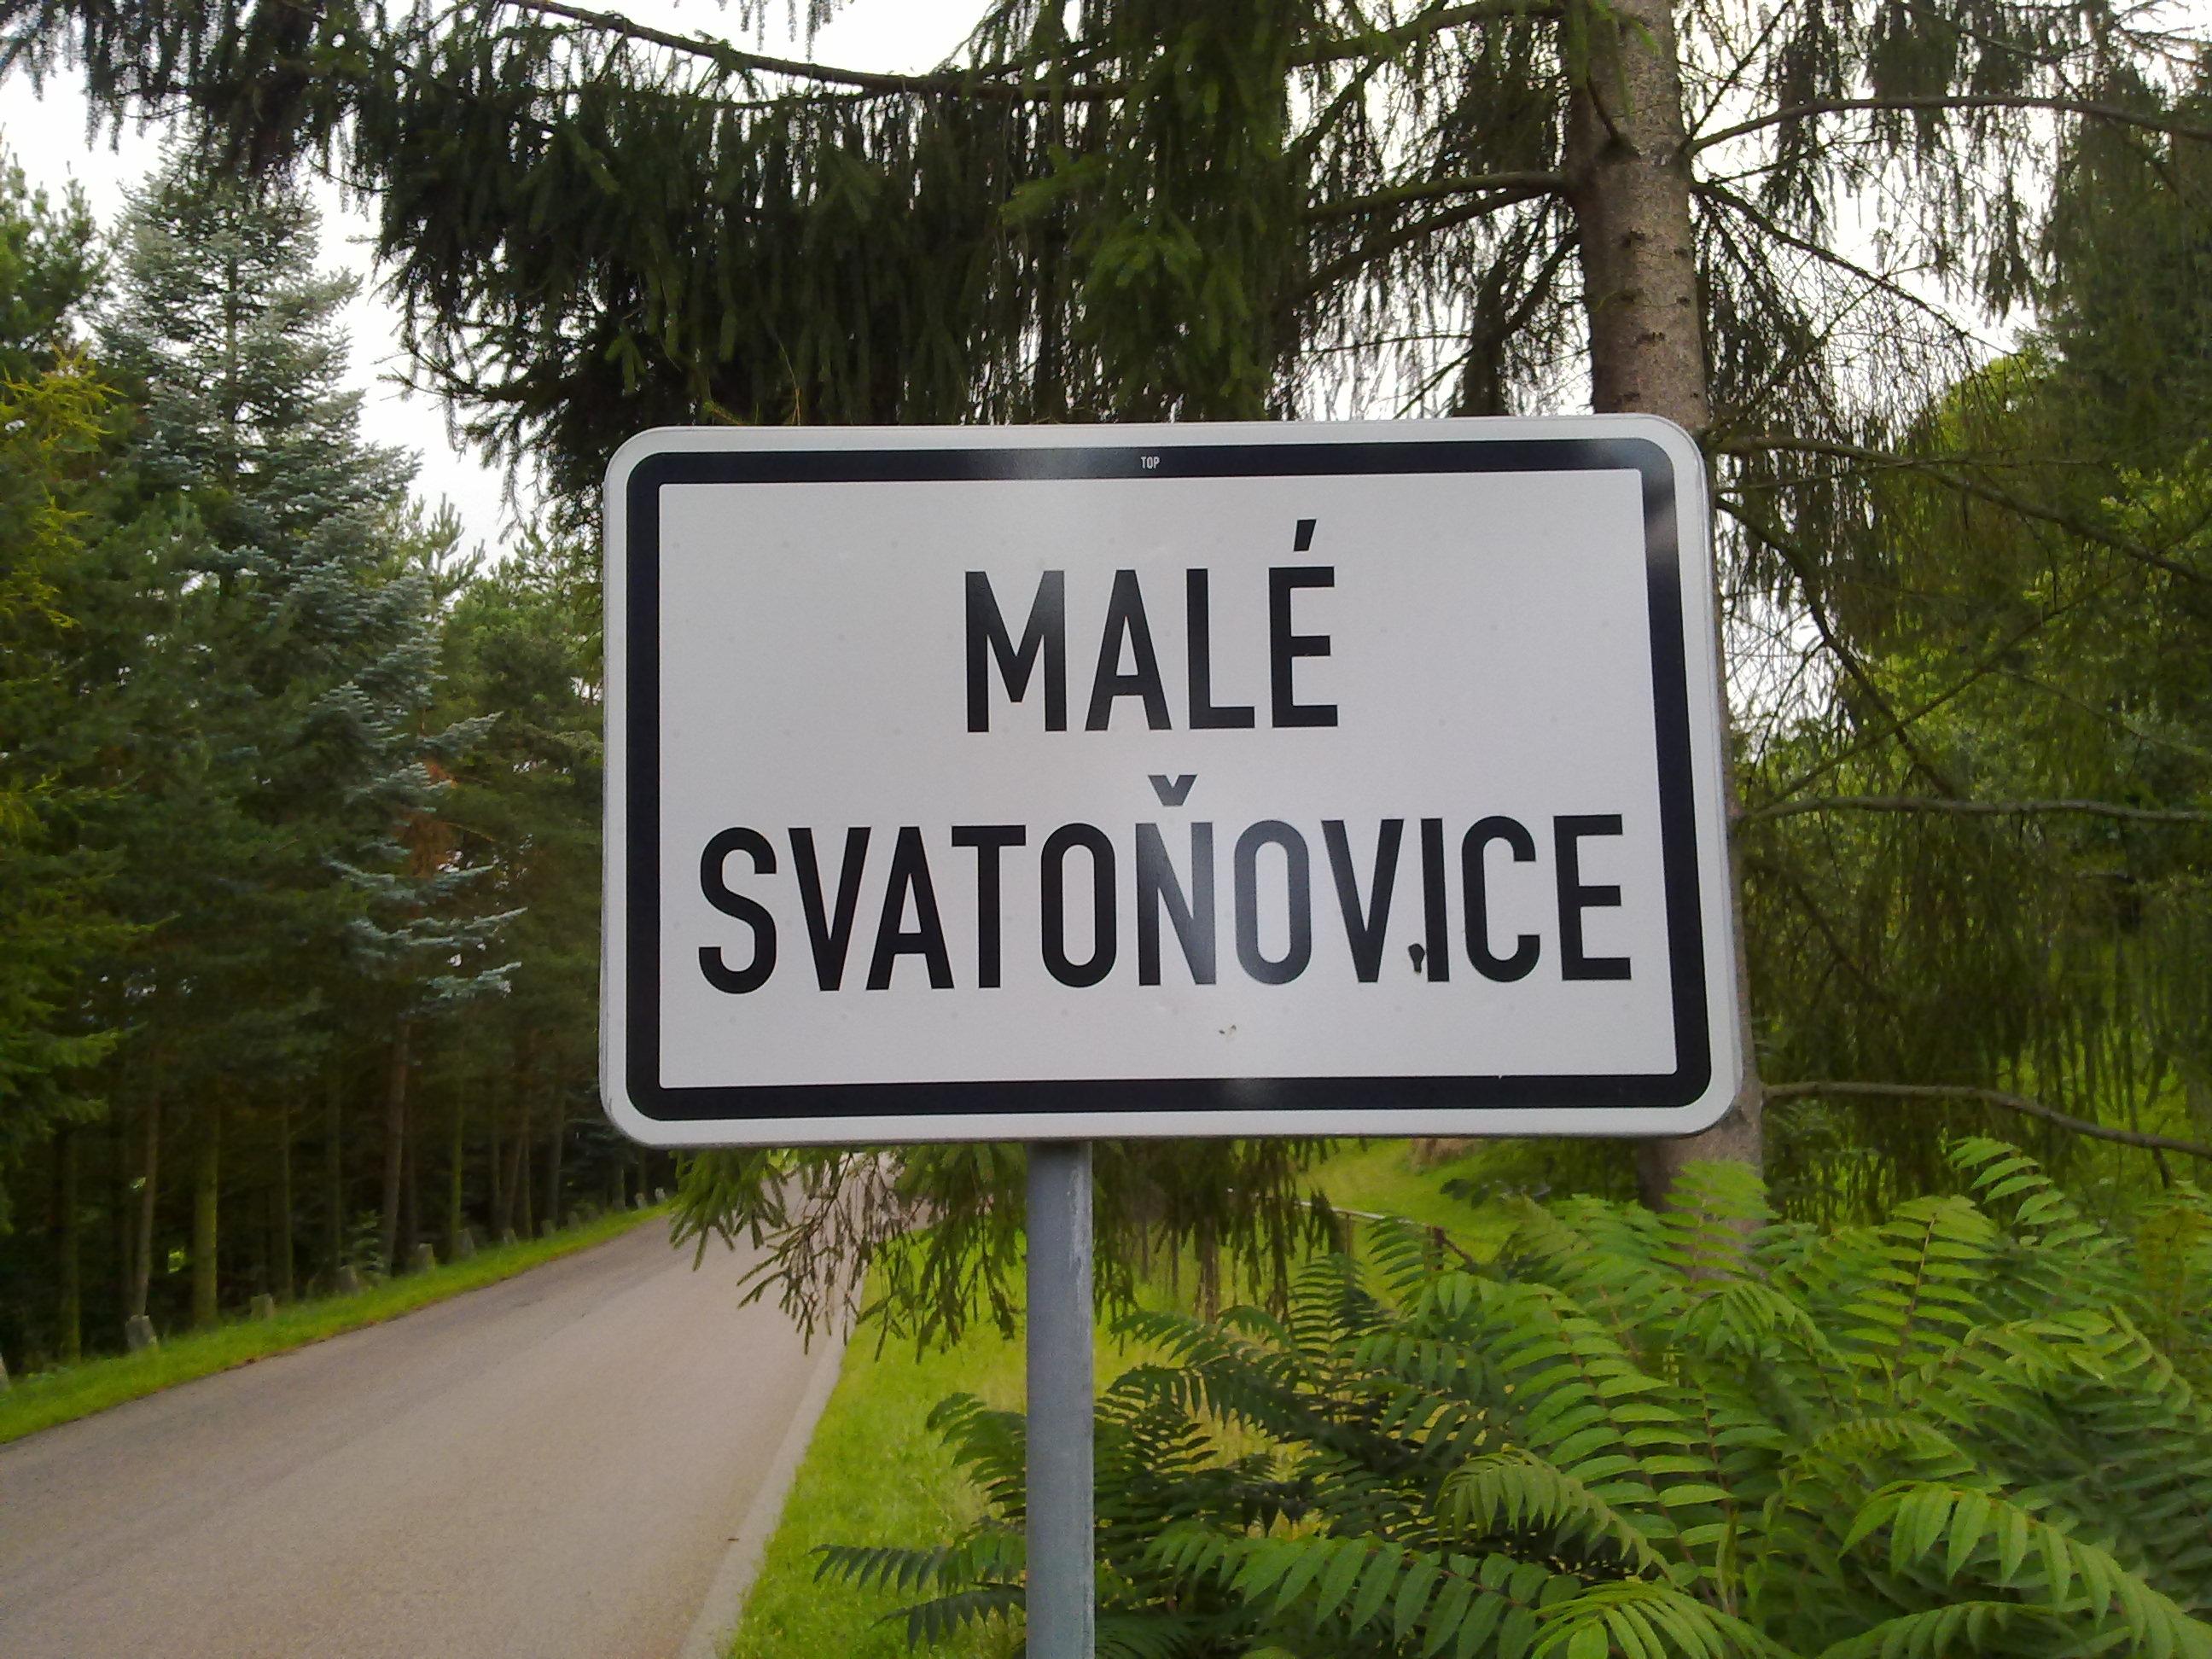 het dorp Male Svatonovice